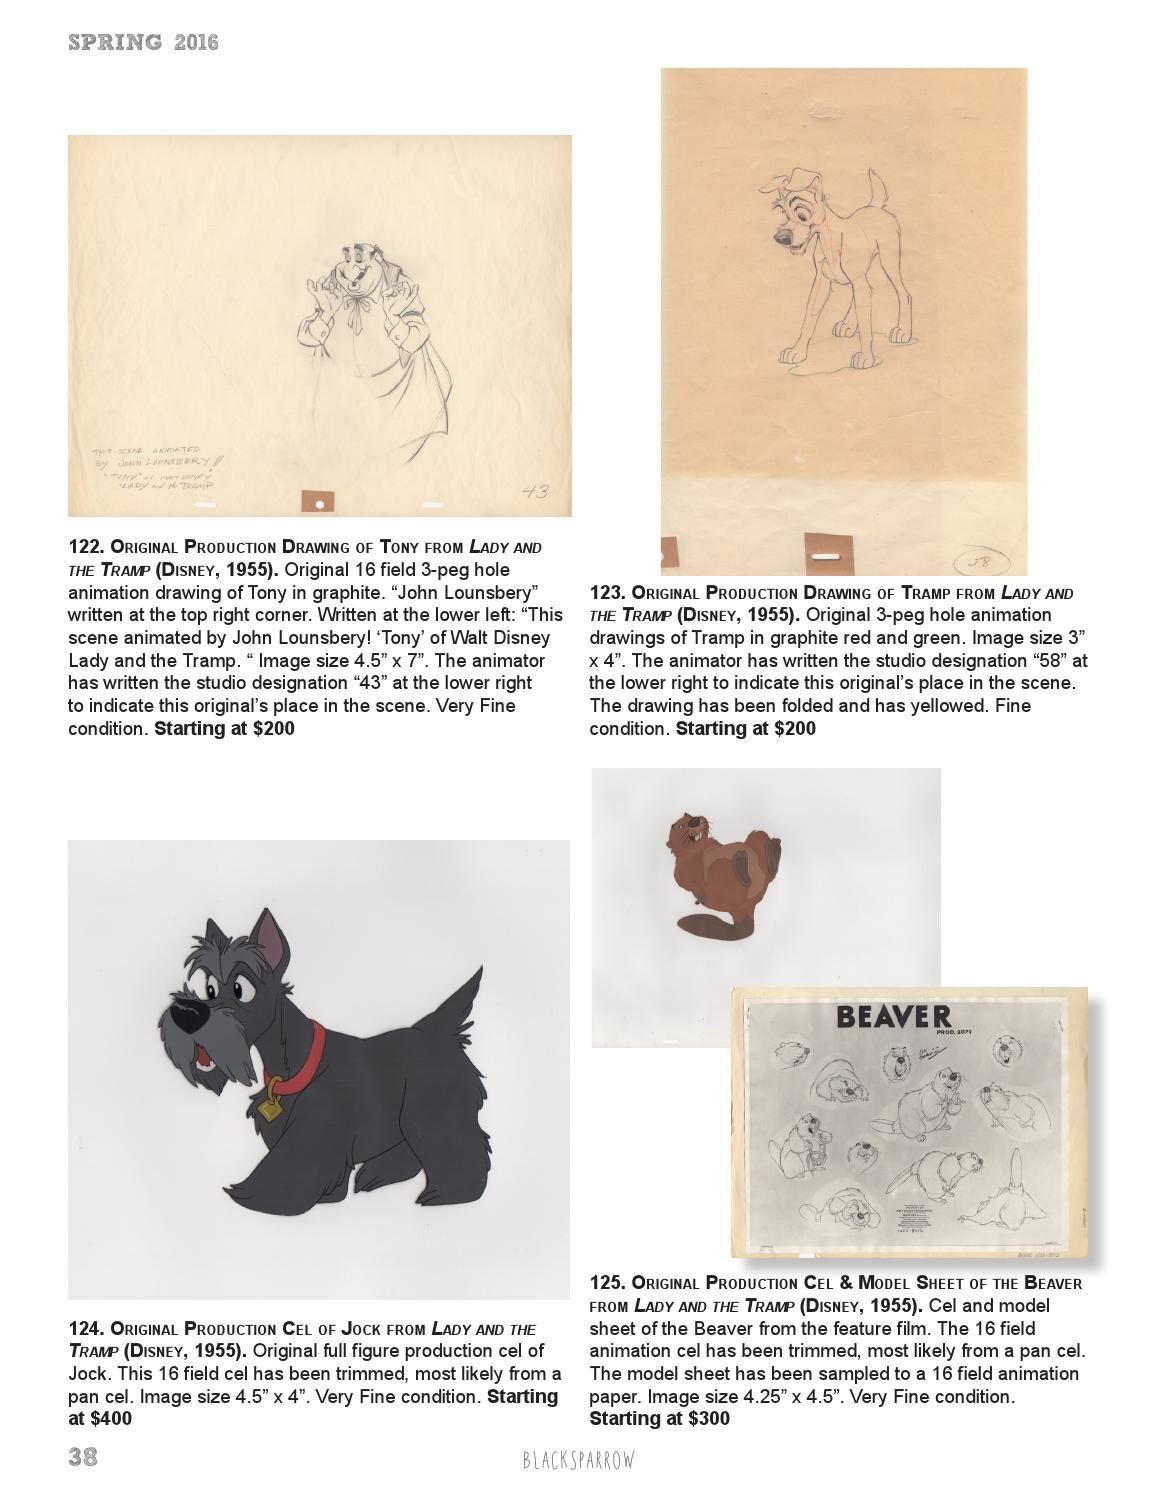 Spring 2016 Animation Auction Catalog by Blacksparrow - issuu